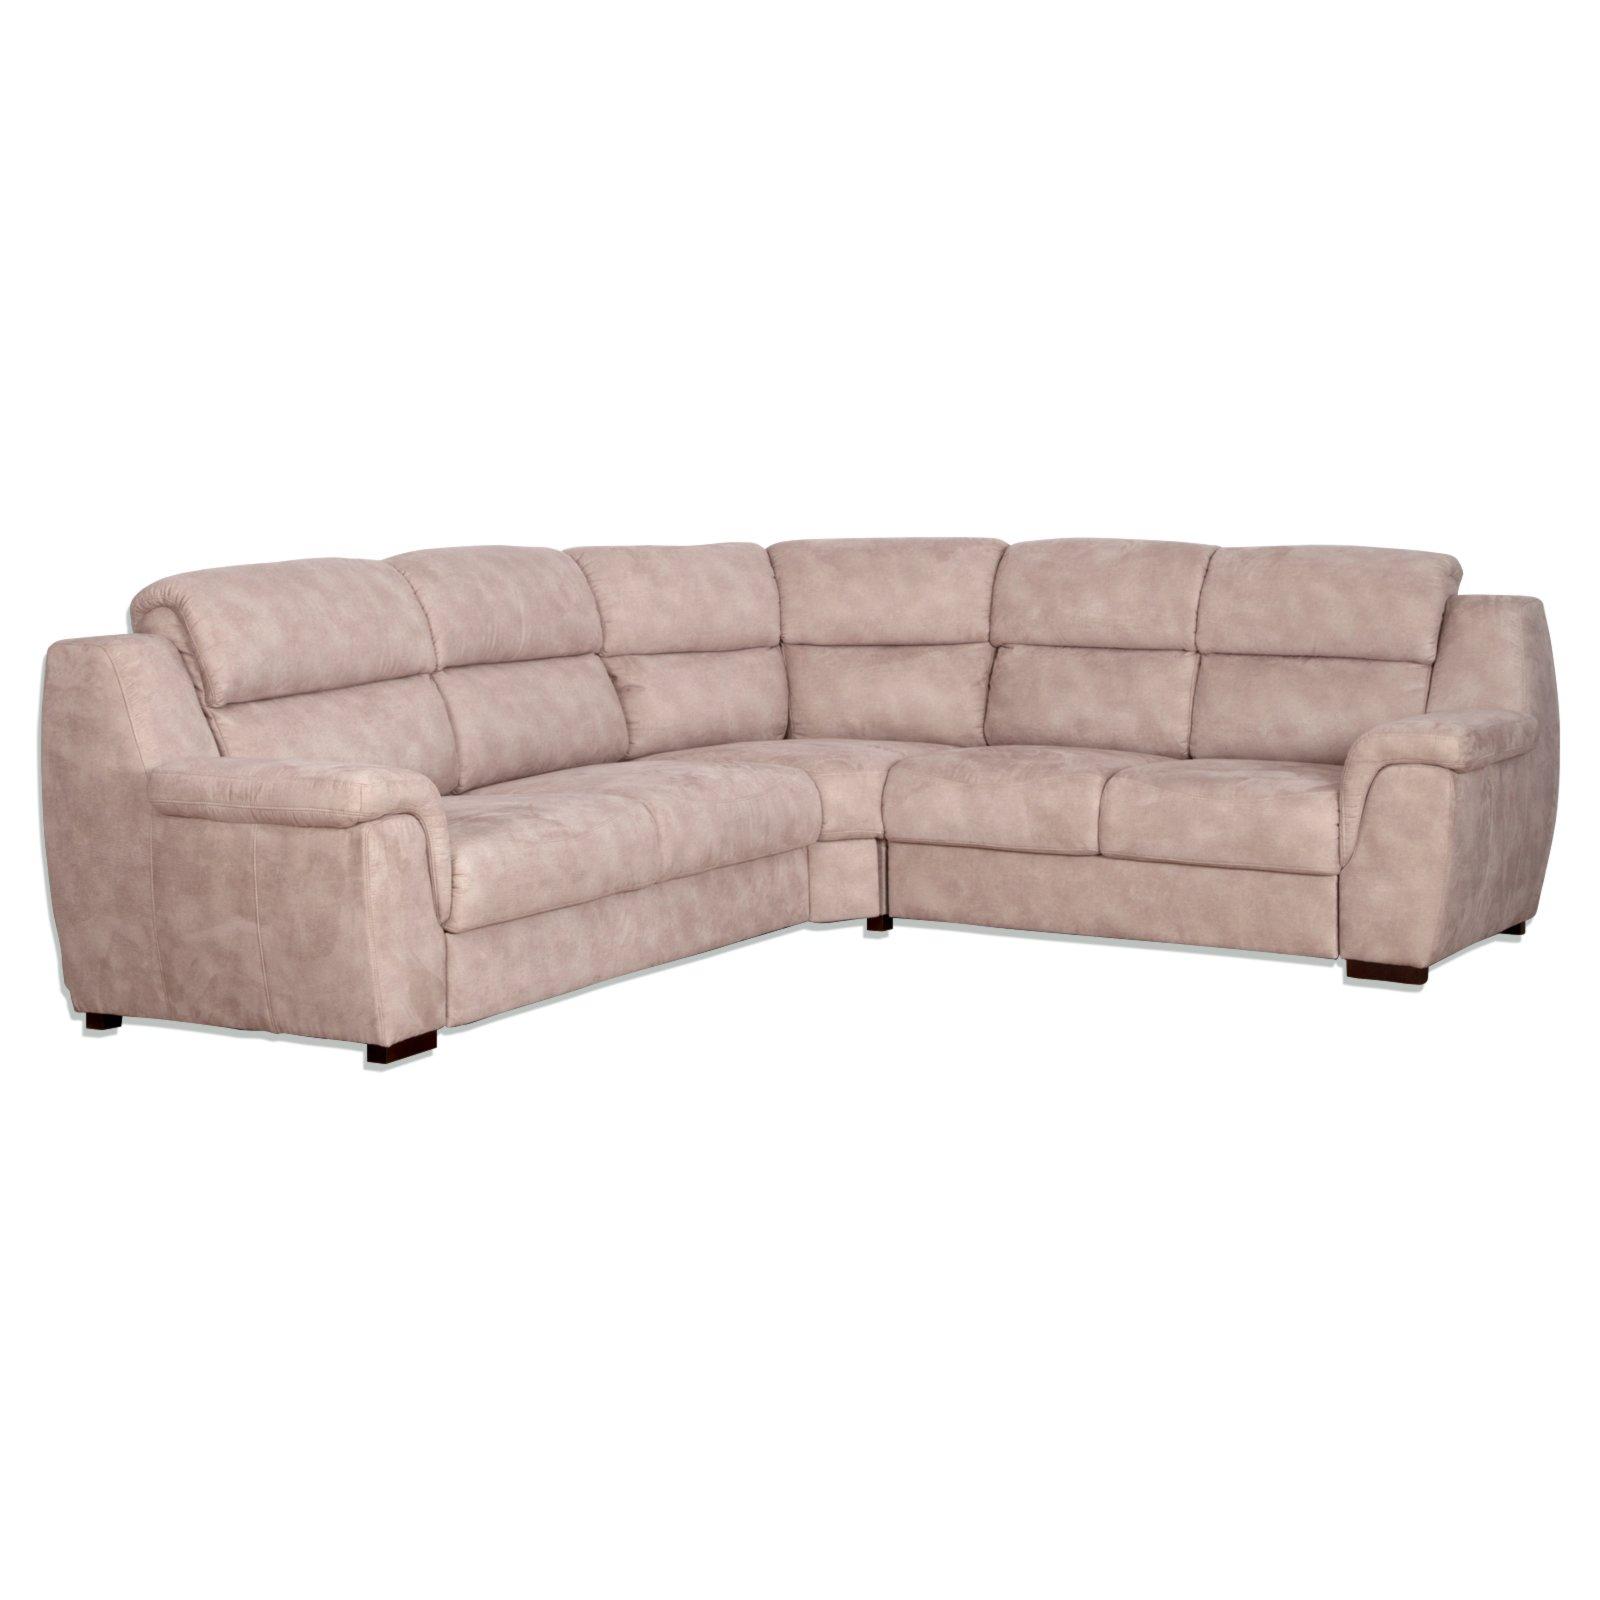 ecksofa beige microfaser ecksofas l form sofas couches m bel roller m belhaus. Black Bedroom Furniture Sets. Home Design Ideas